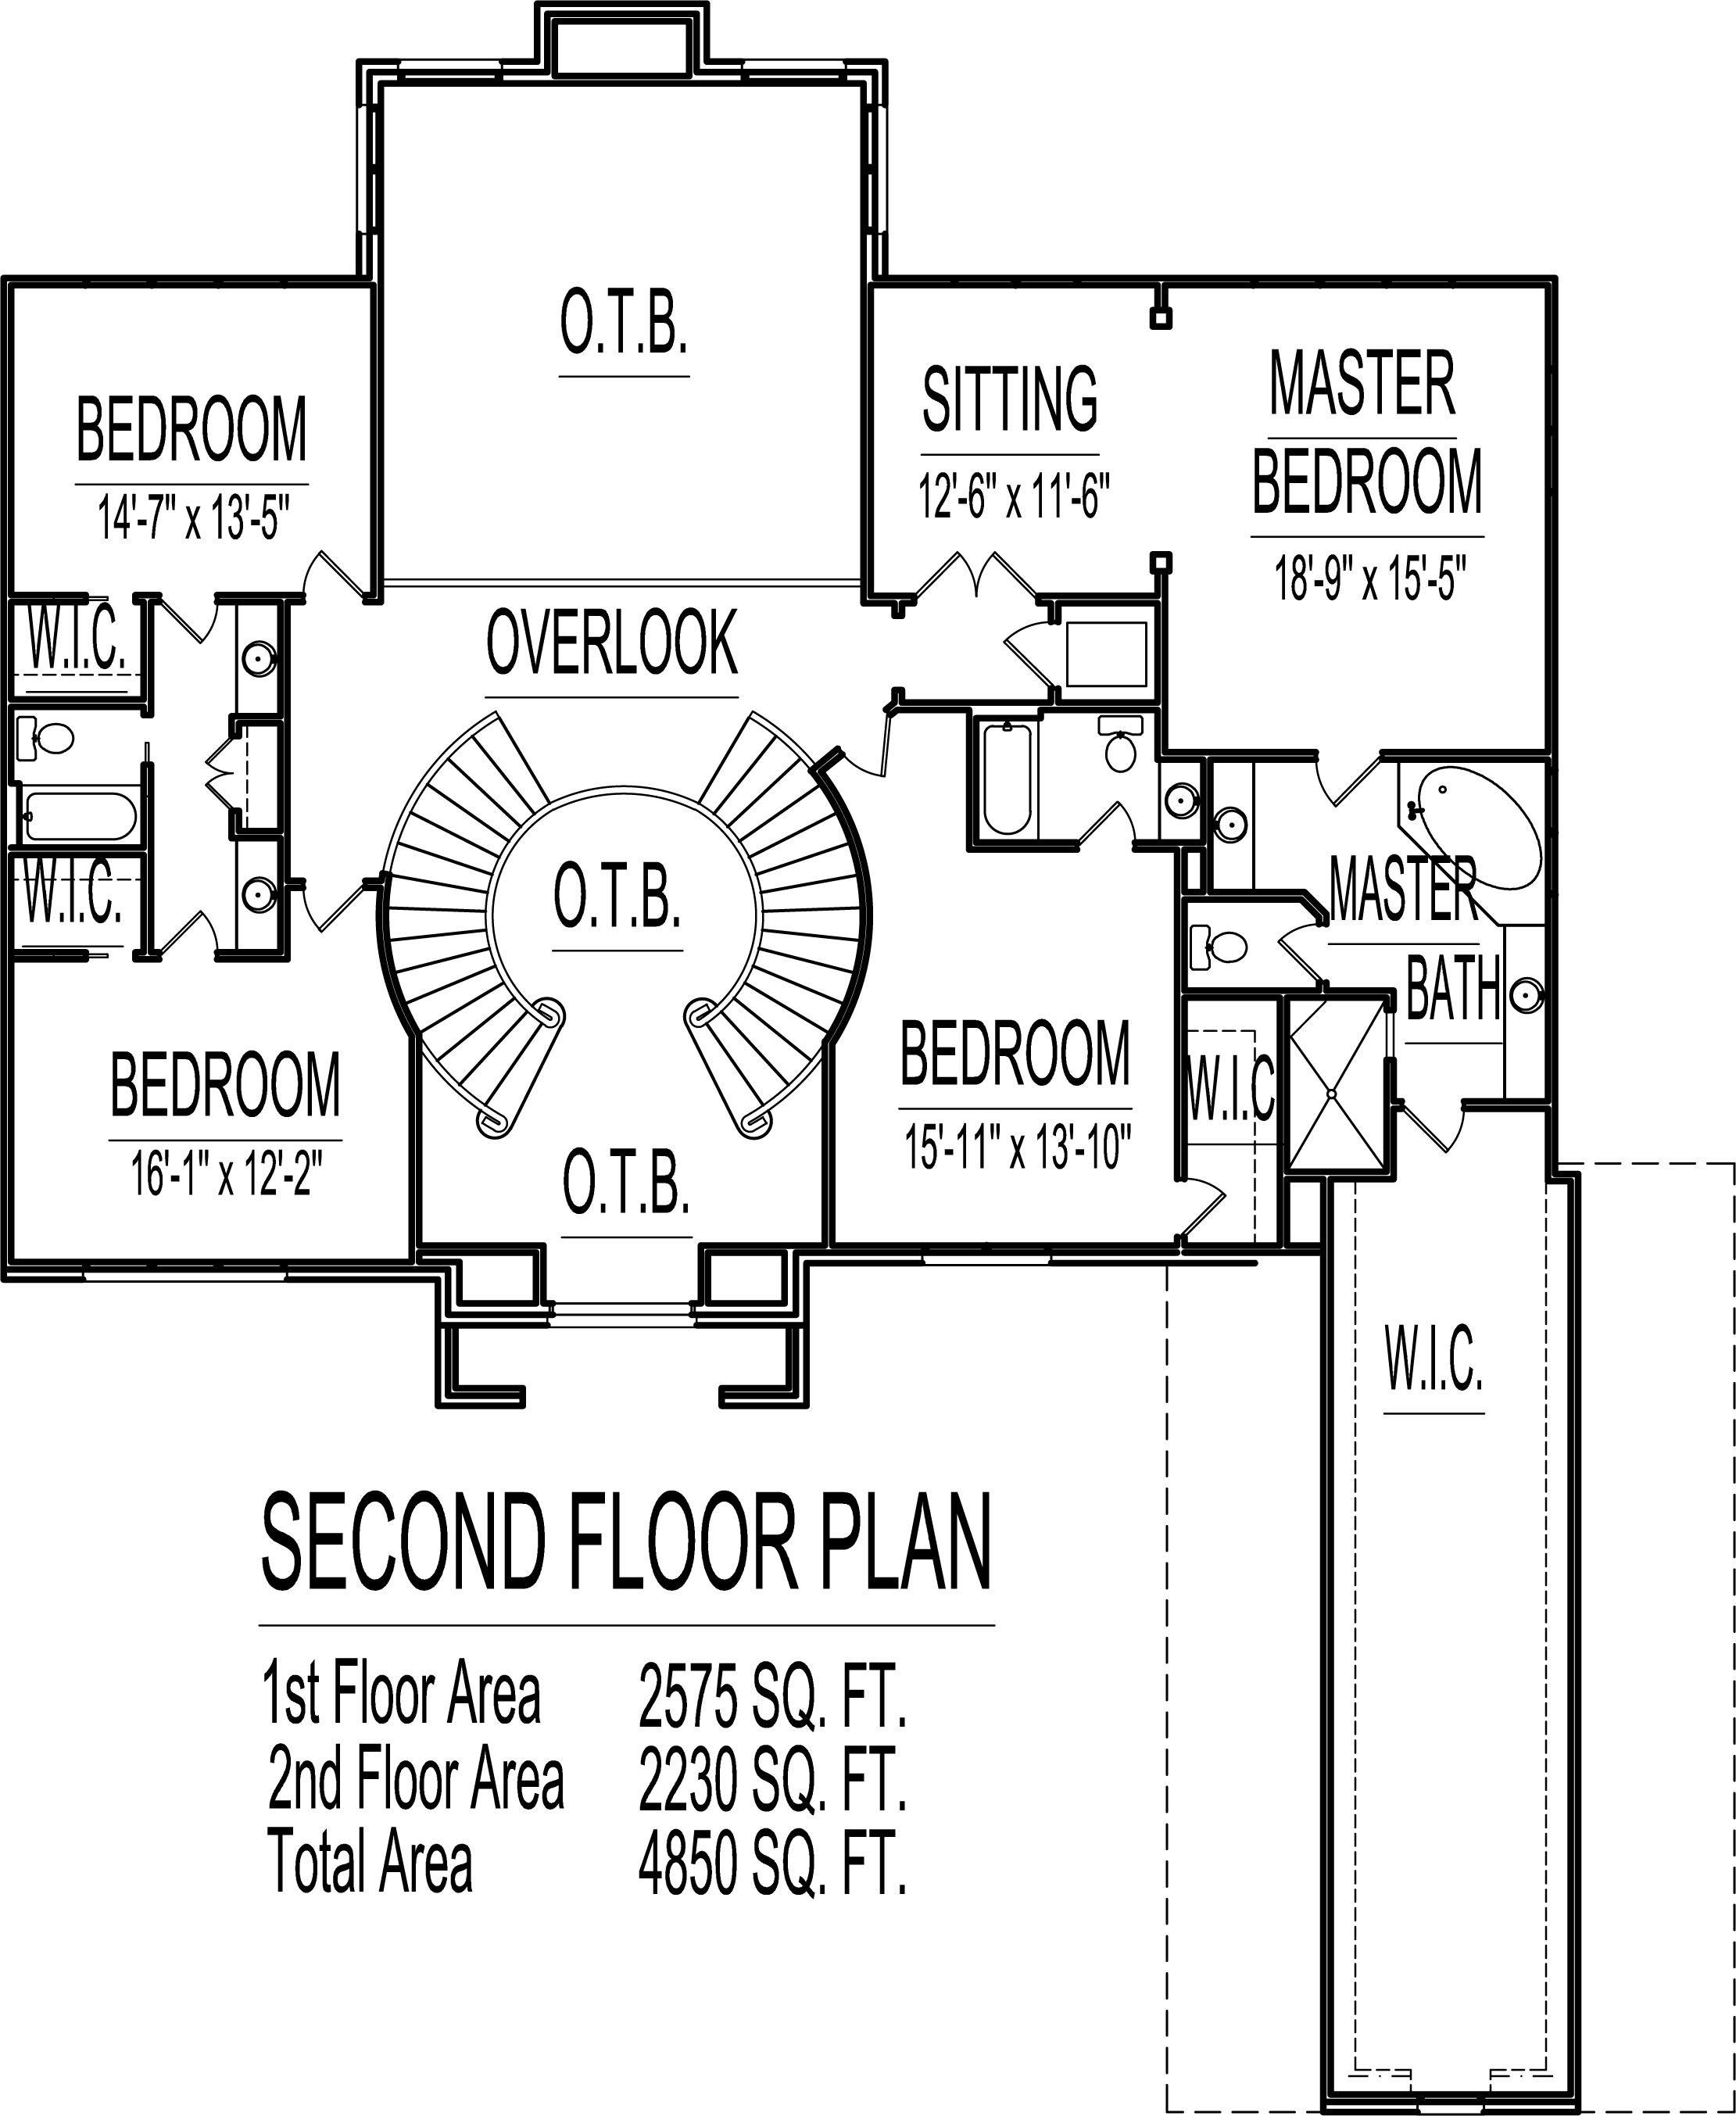 4 bedroom 2 story house plans 4500 sq ft atlanta augusta